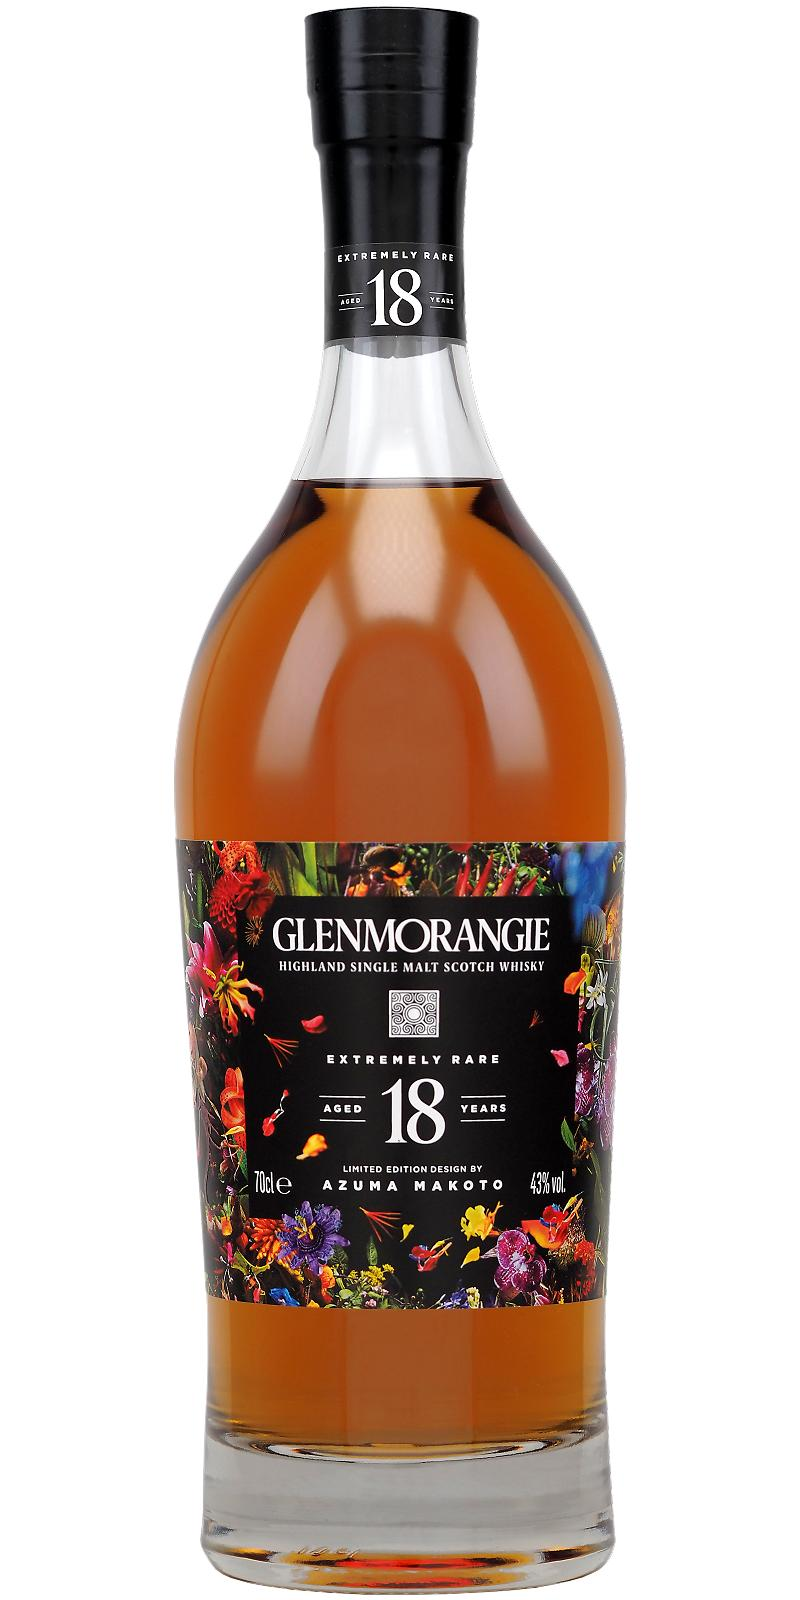 Glenmorangie 18-year old